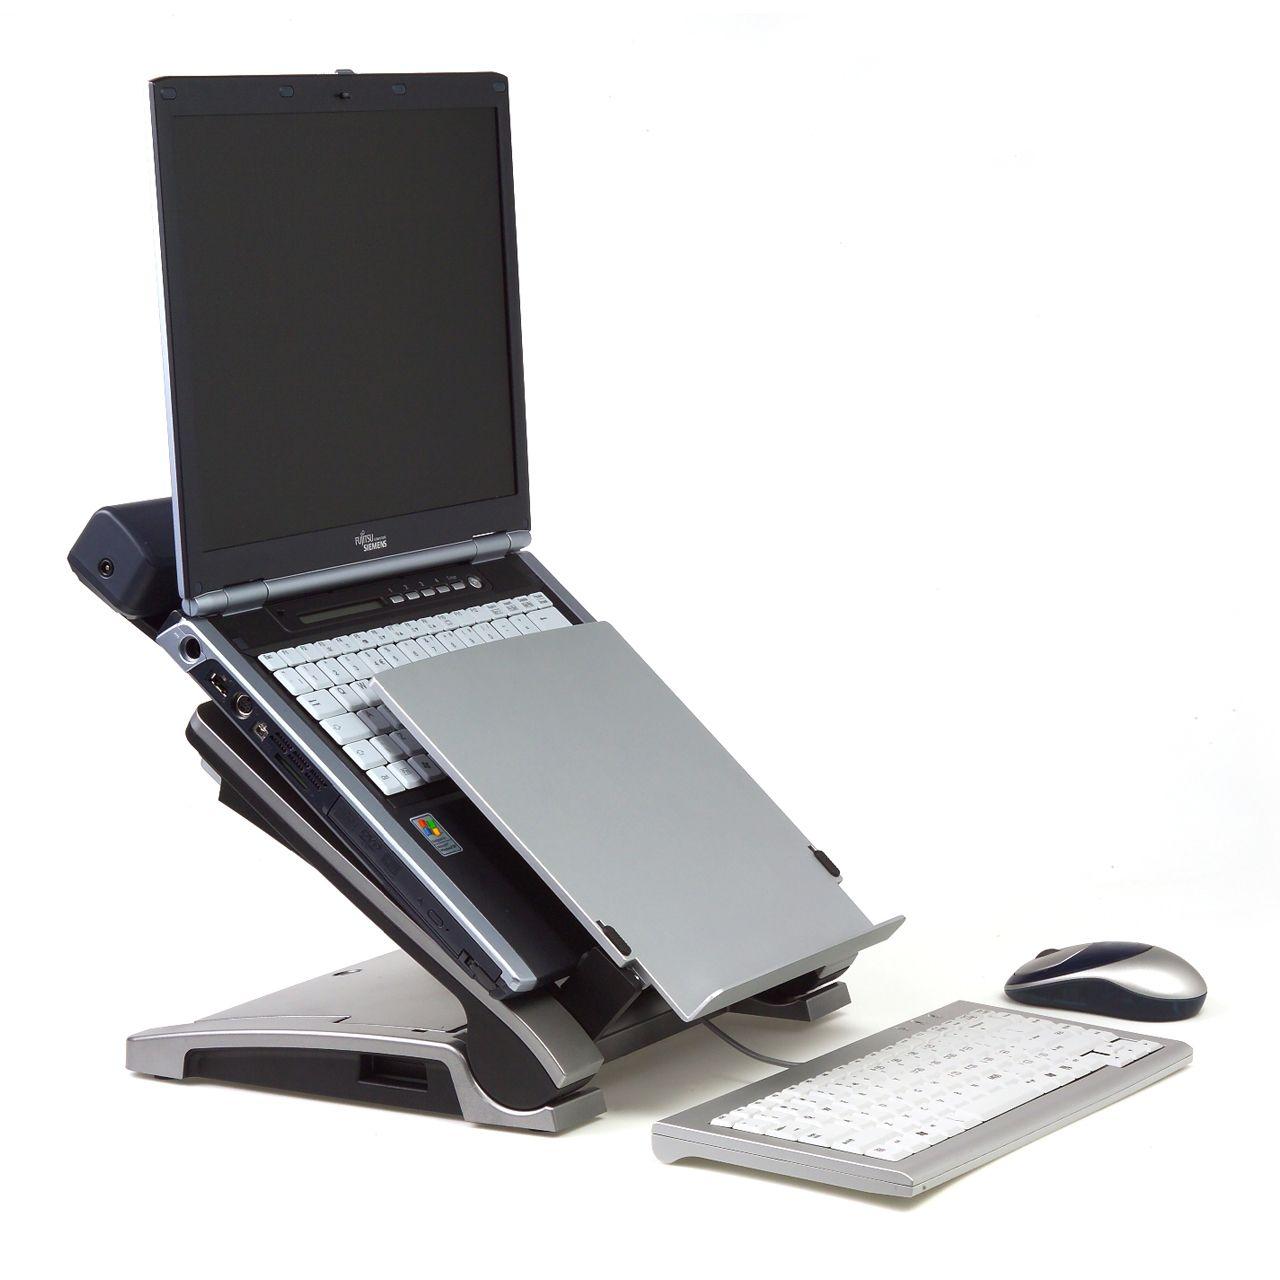 Ergo-T 340 laptophouder Gebruik